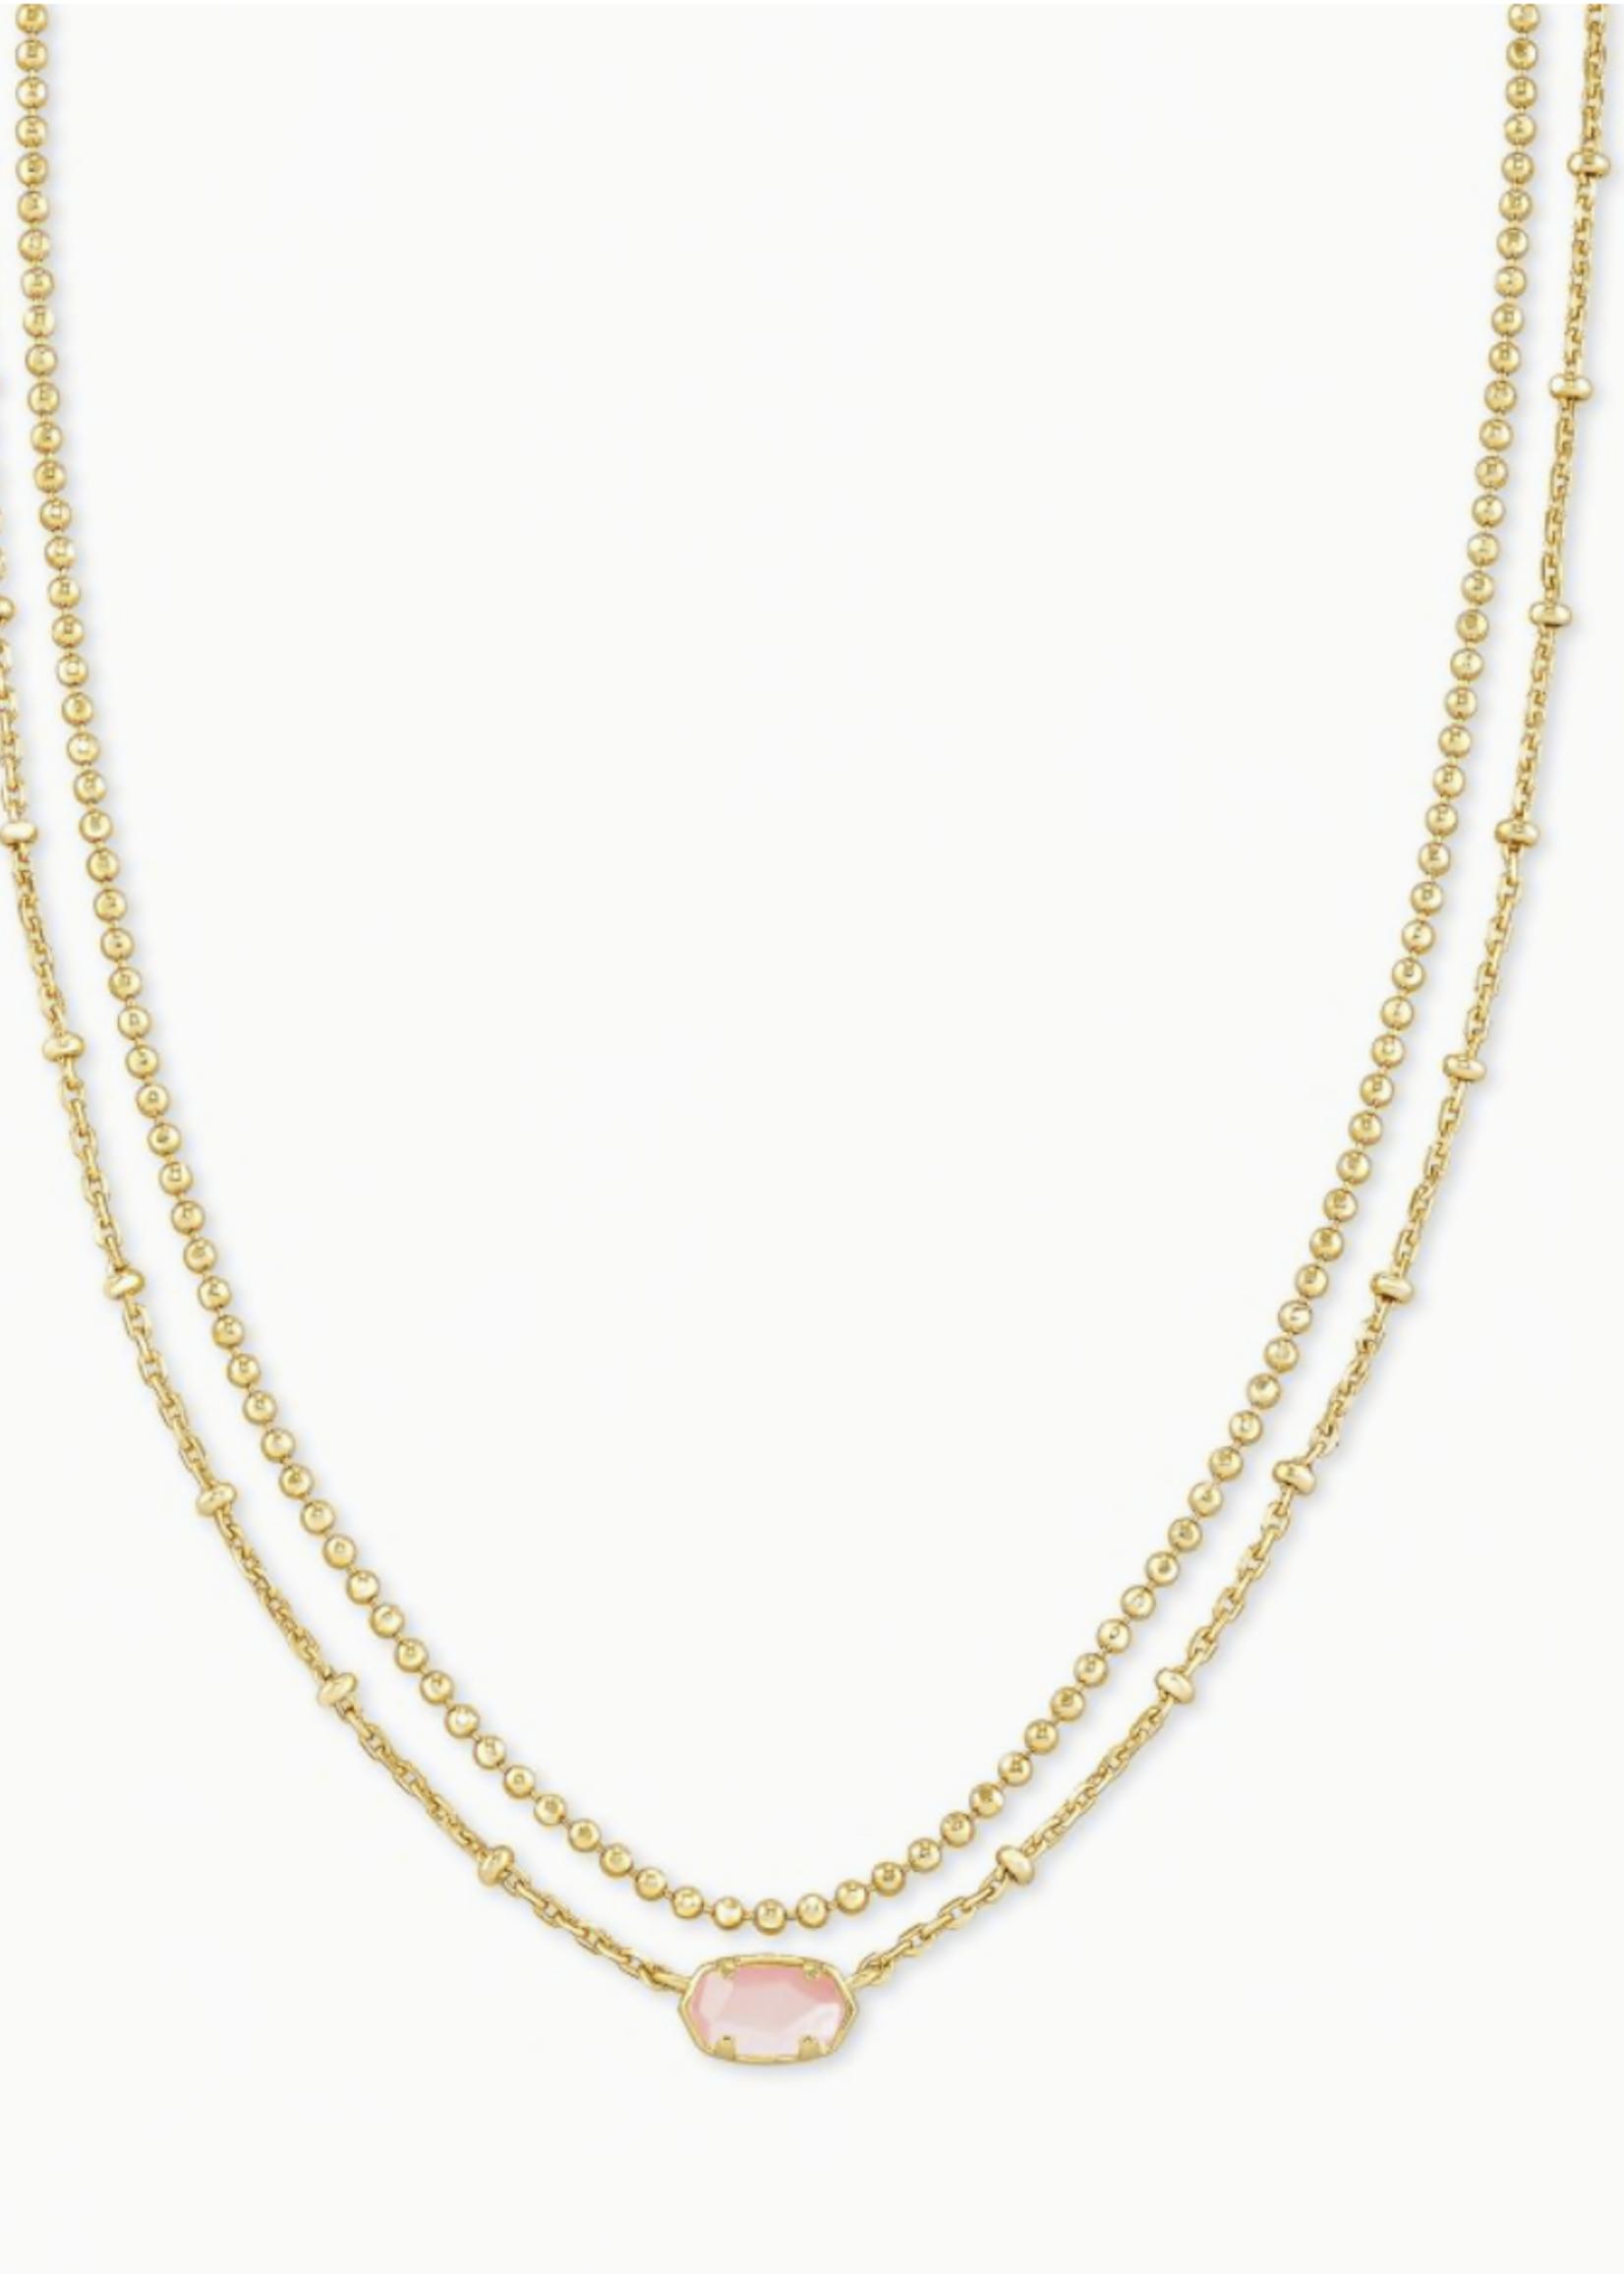 Kendra Scott Kendra Scott Emile Multi Strand Necklace Rose